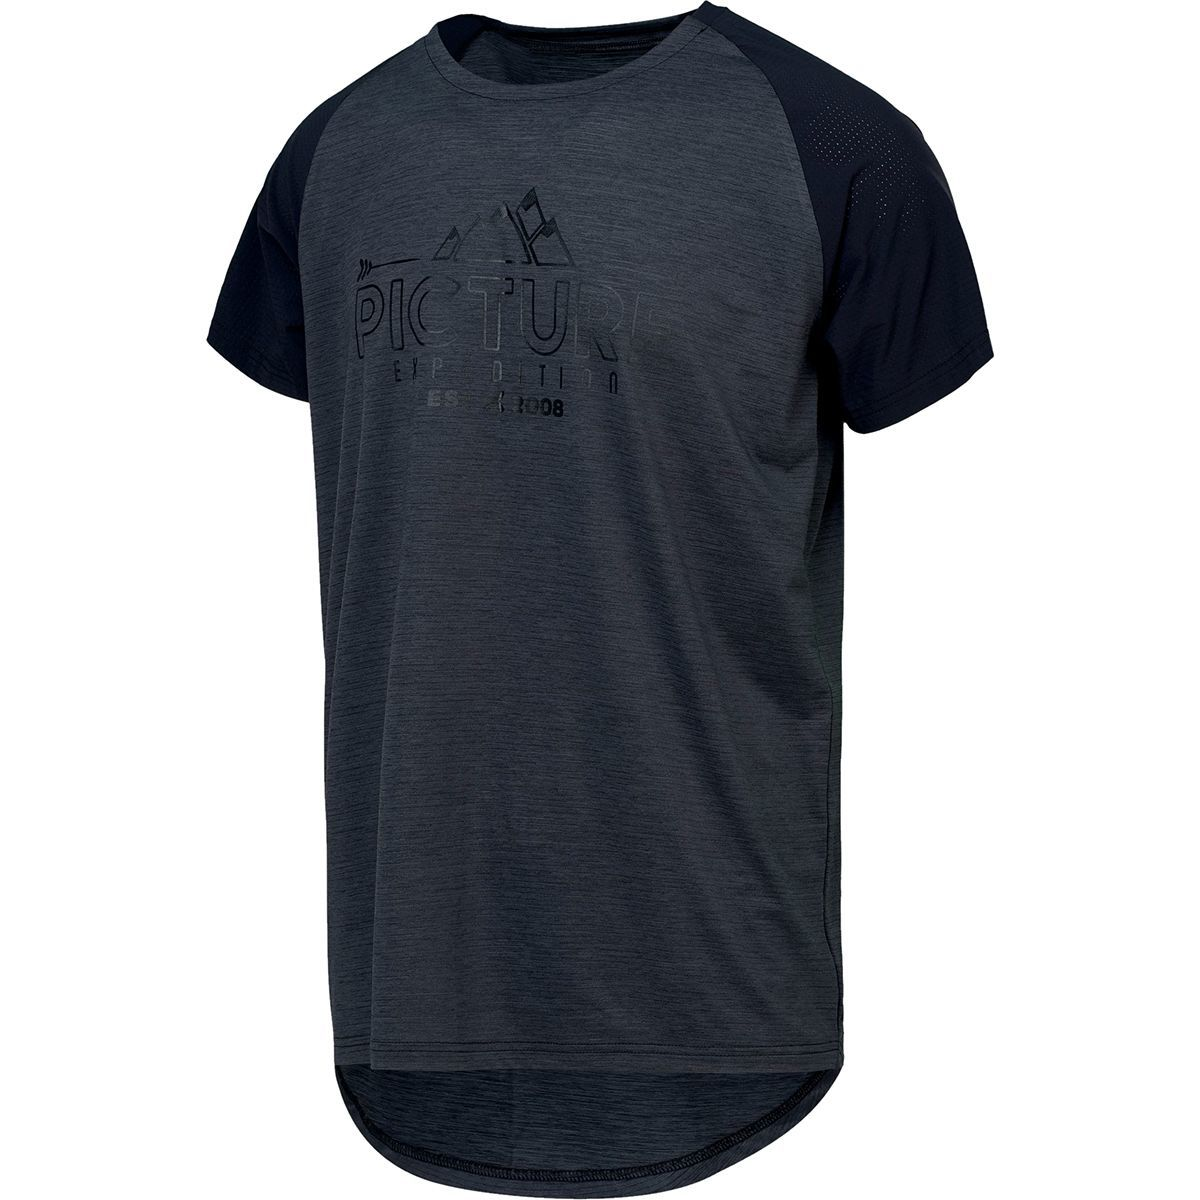 Picture Organic Oddisee Tech Short-Sleeve T-Shirt - Men's